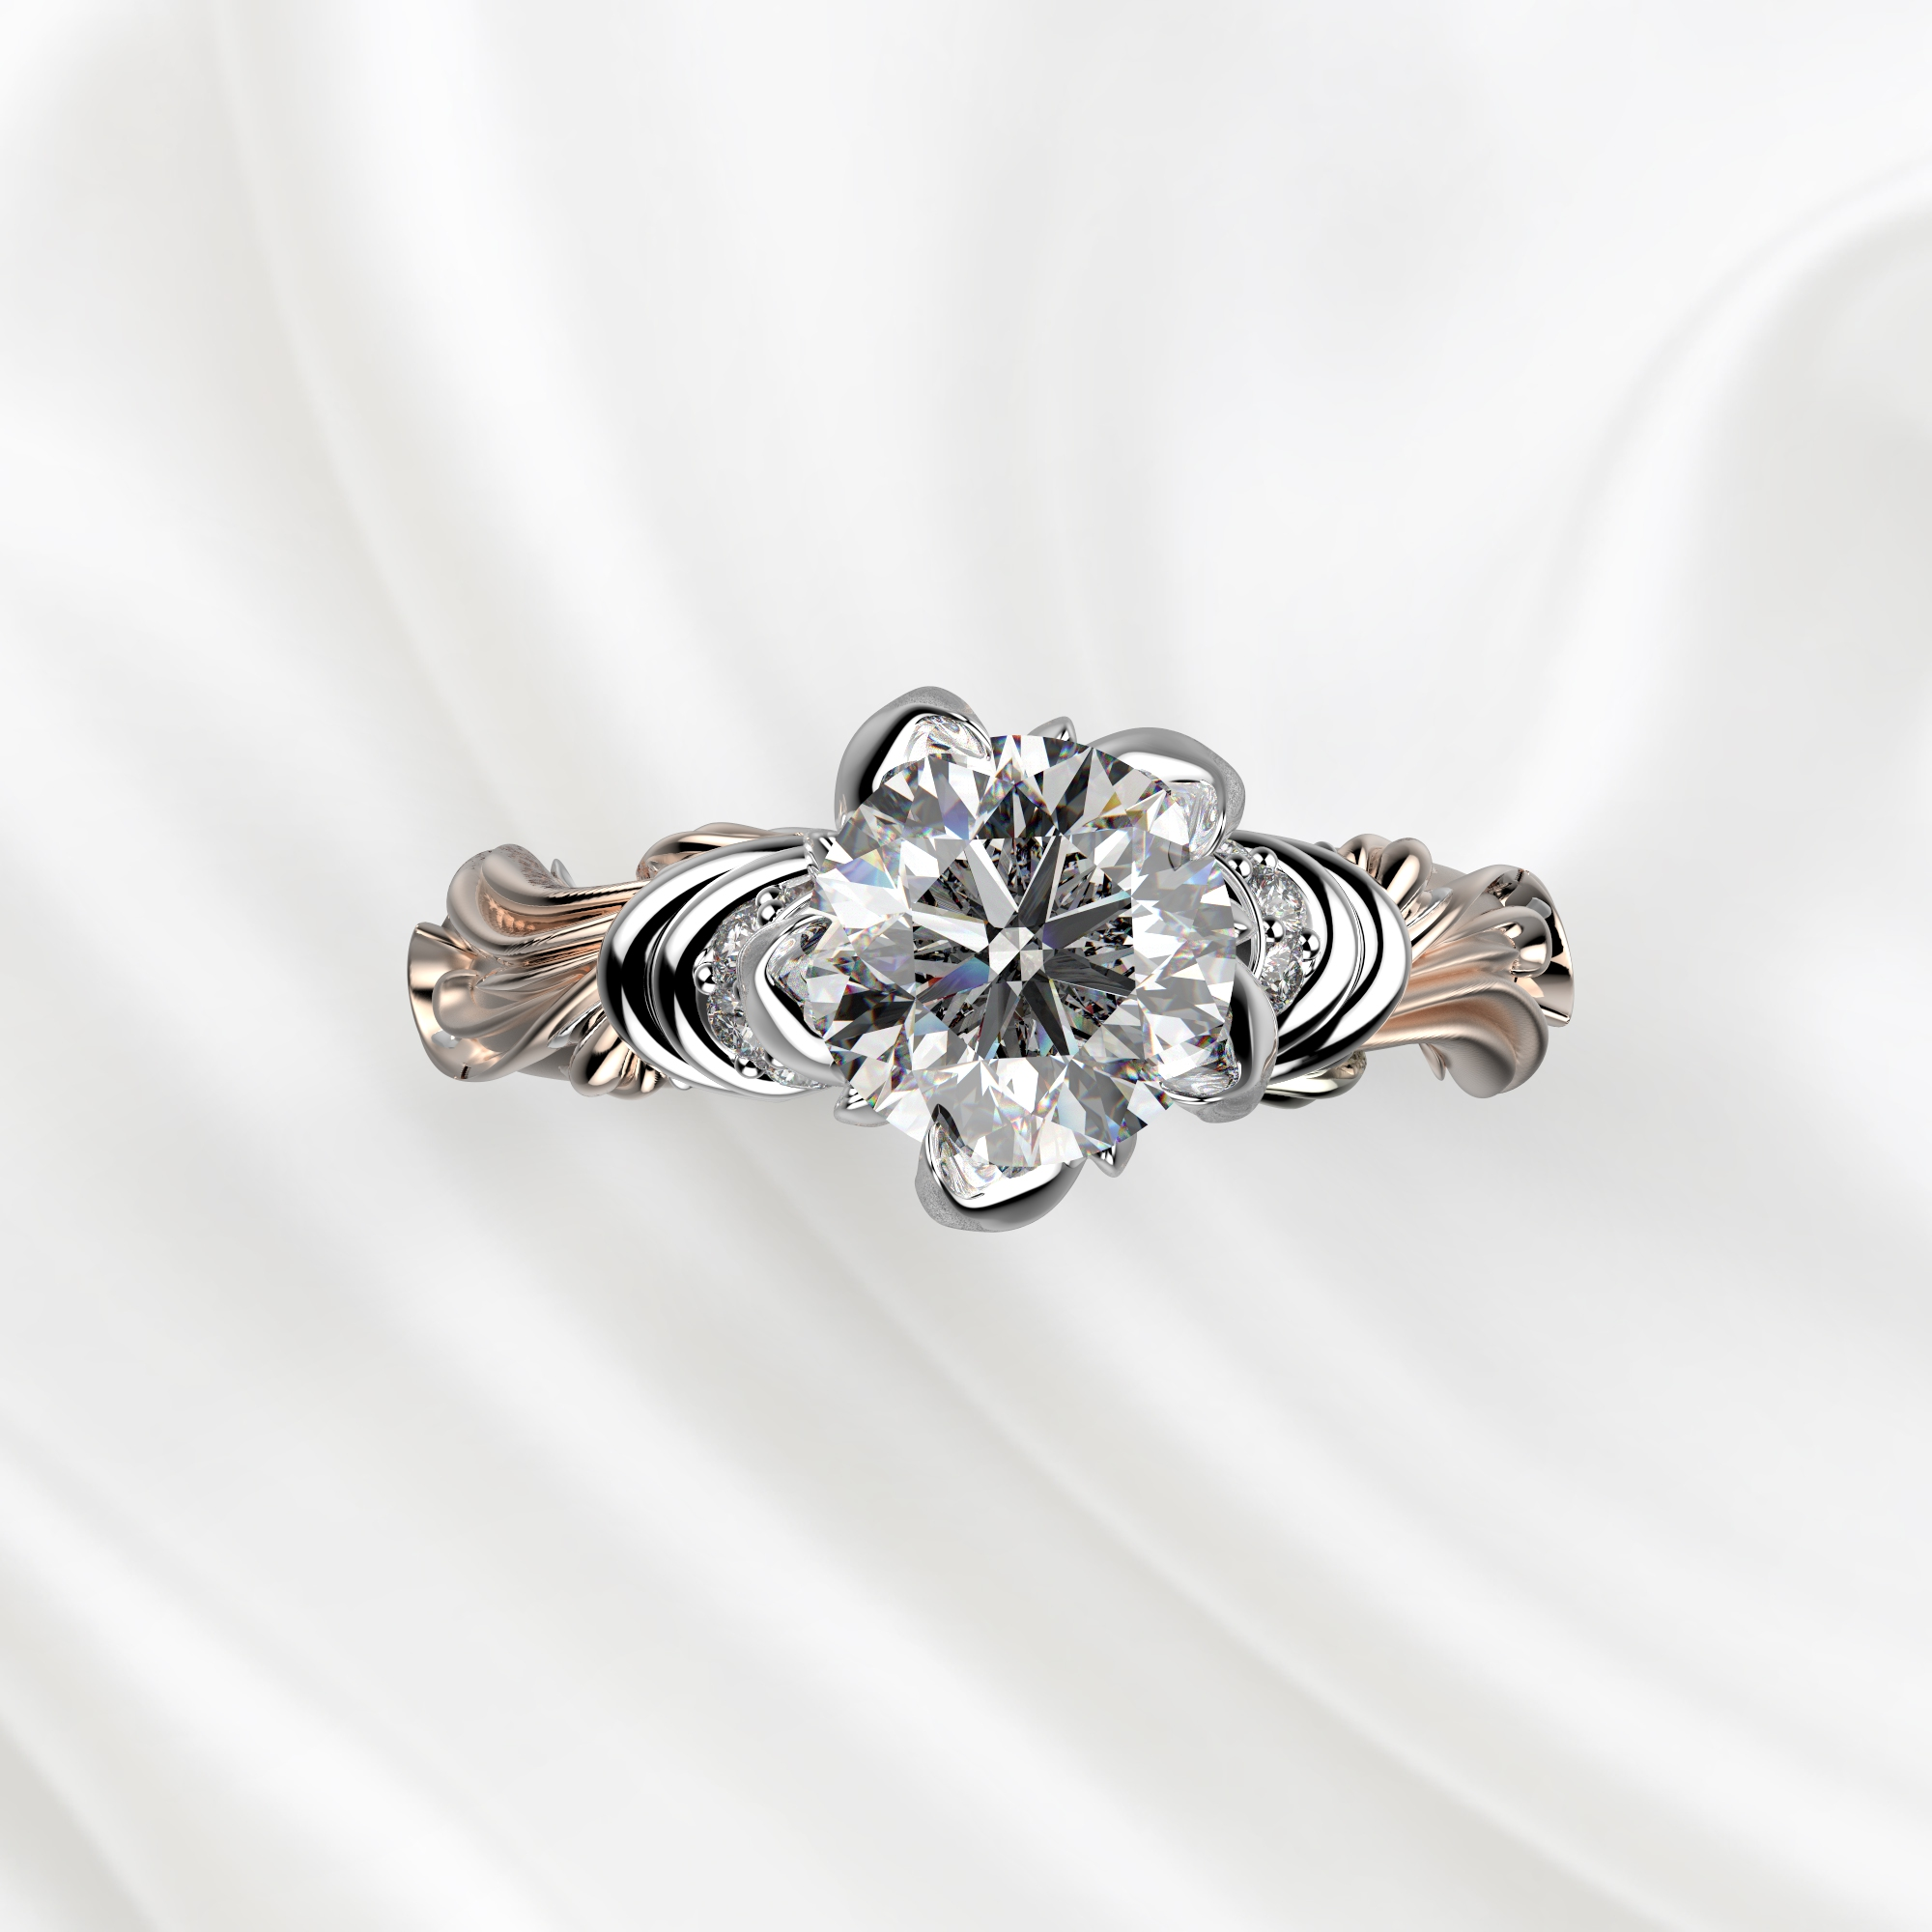 N8 Помолвочное кольцо из розово-белого золота с бриллиантом 0.4 карат